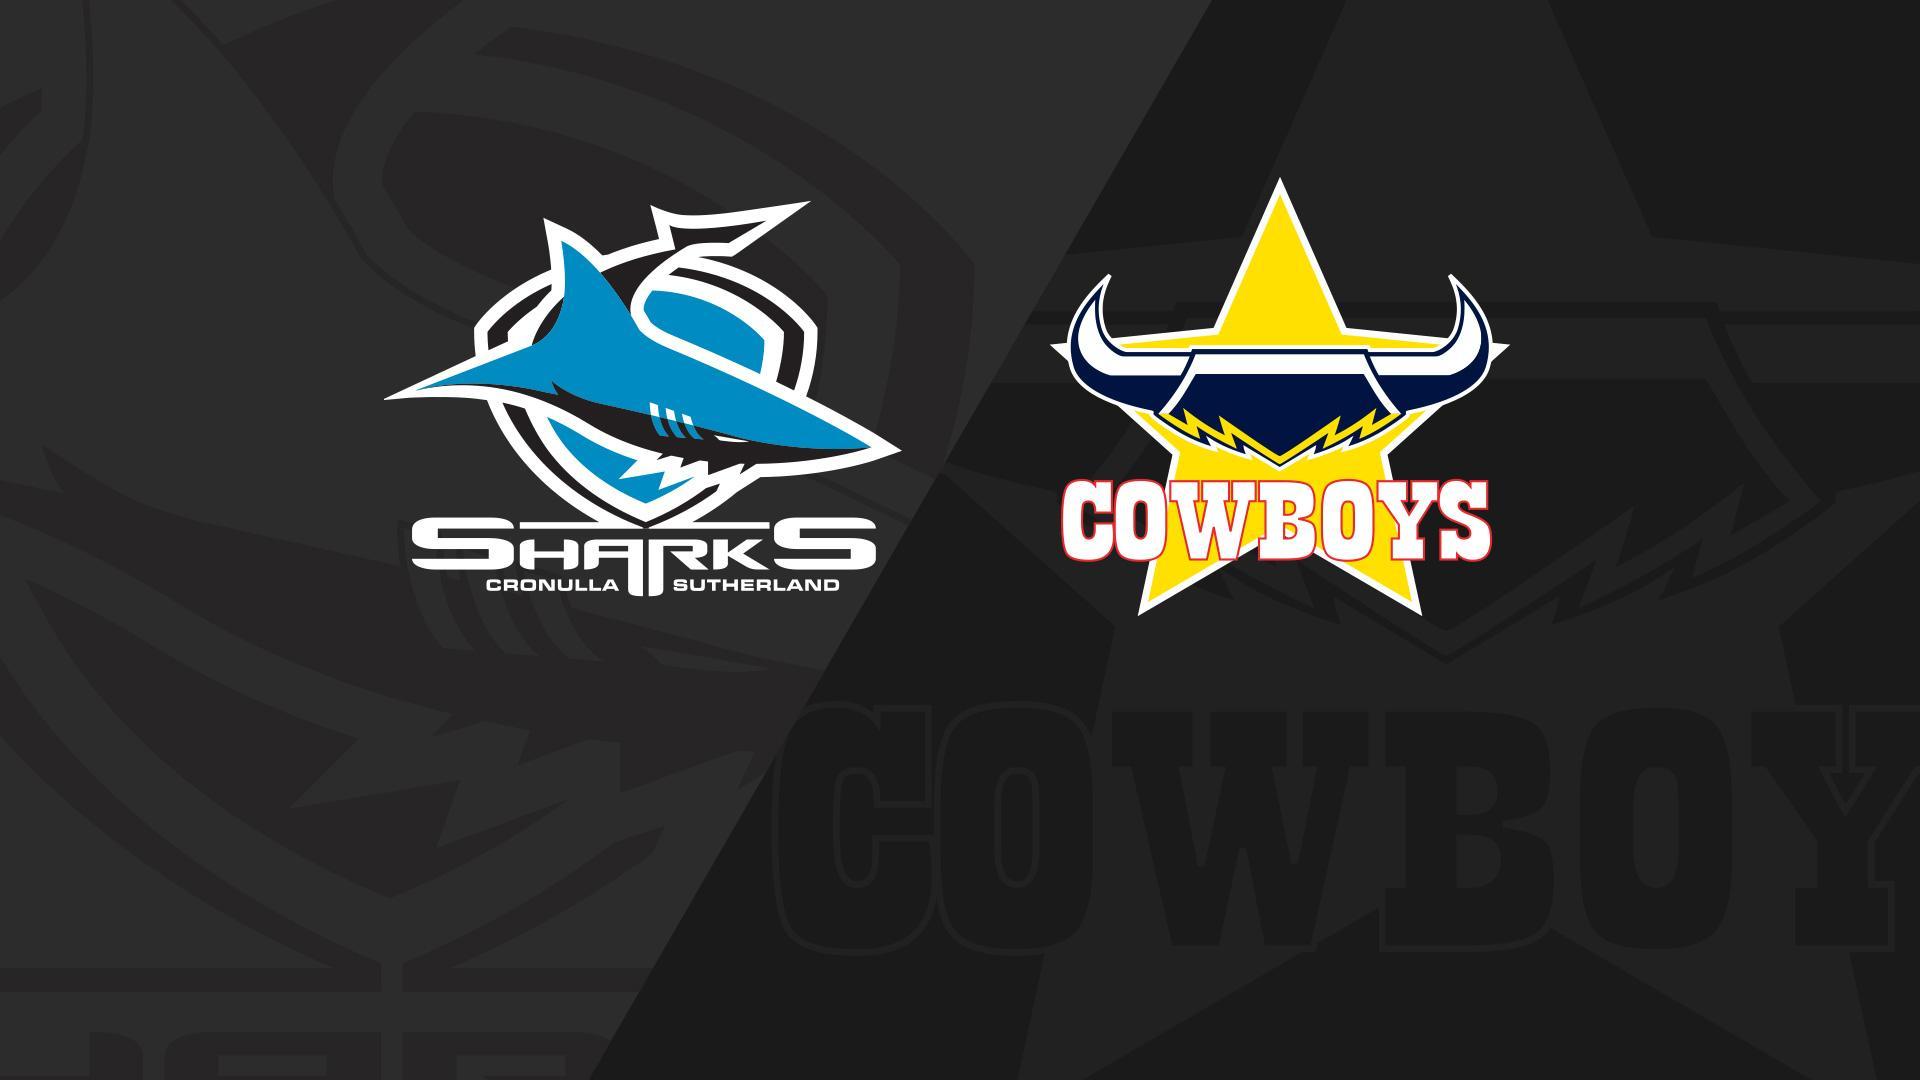 Full Match Replay: Sharks v Cowboys - Round 23, 2018